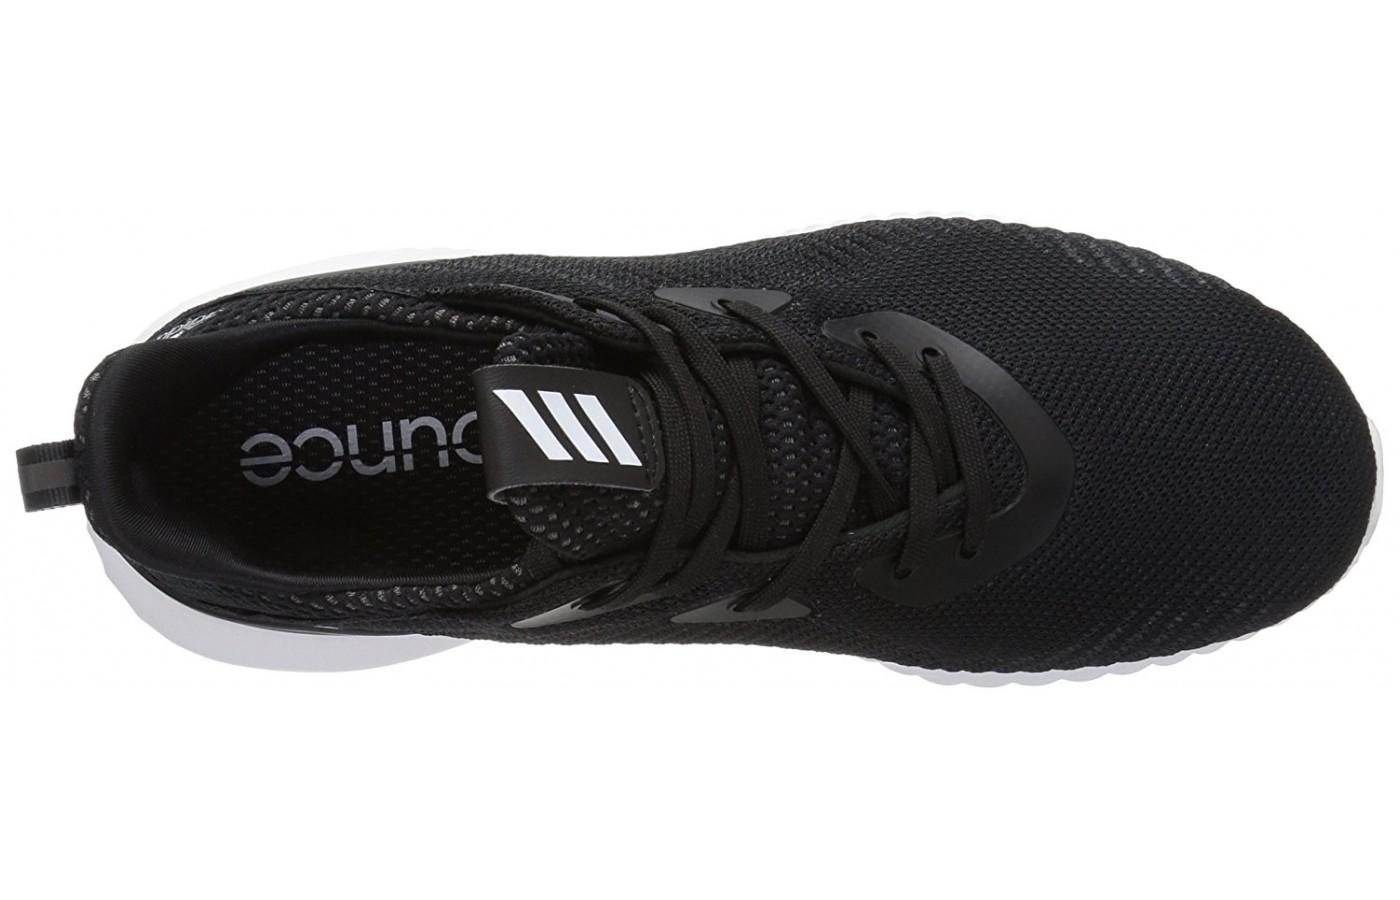 Adidas Alphabounce upper